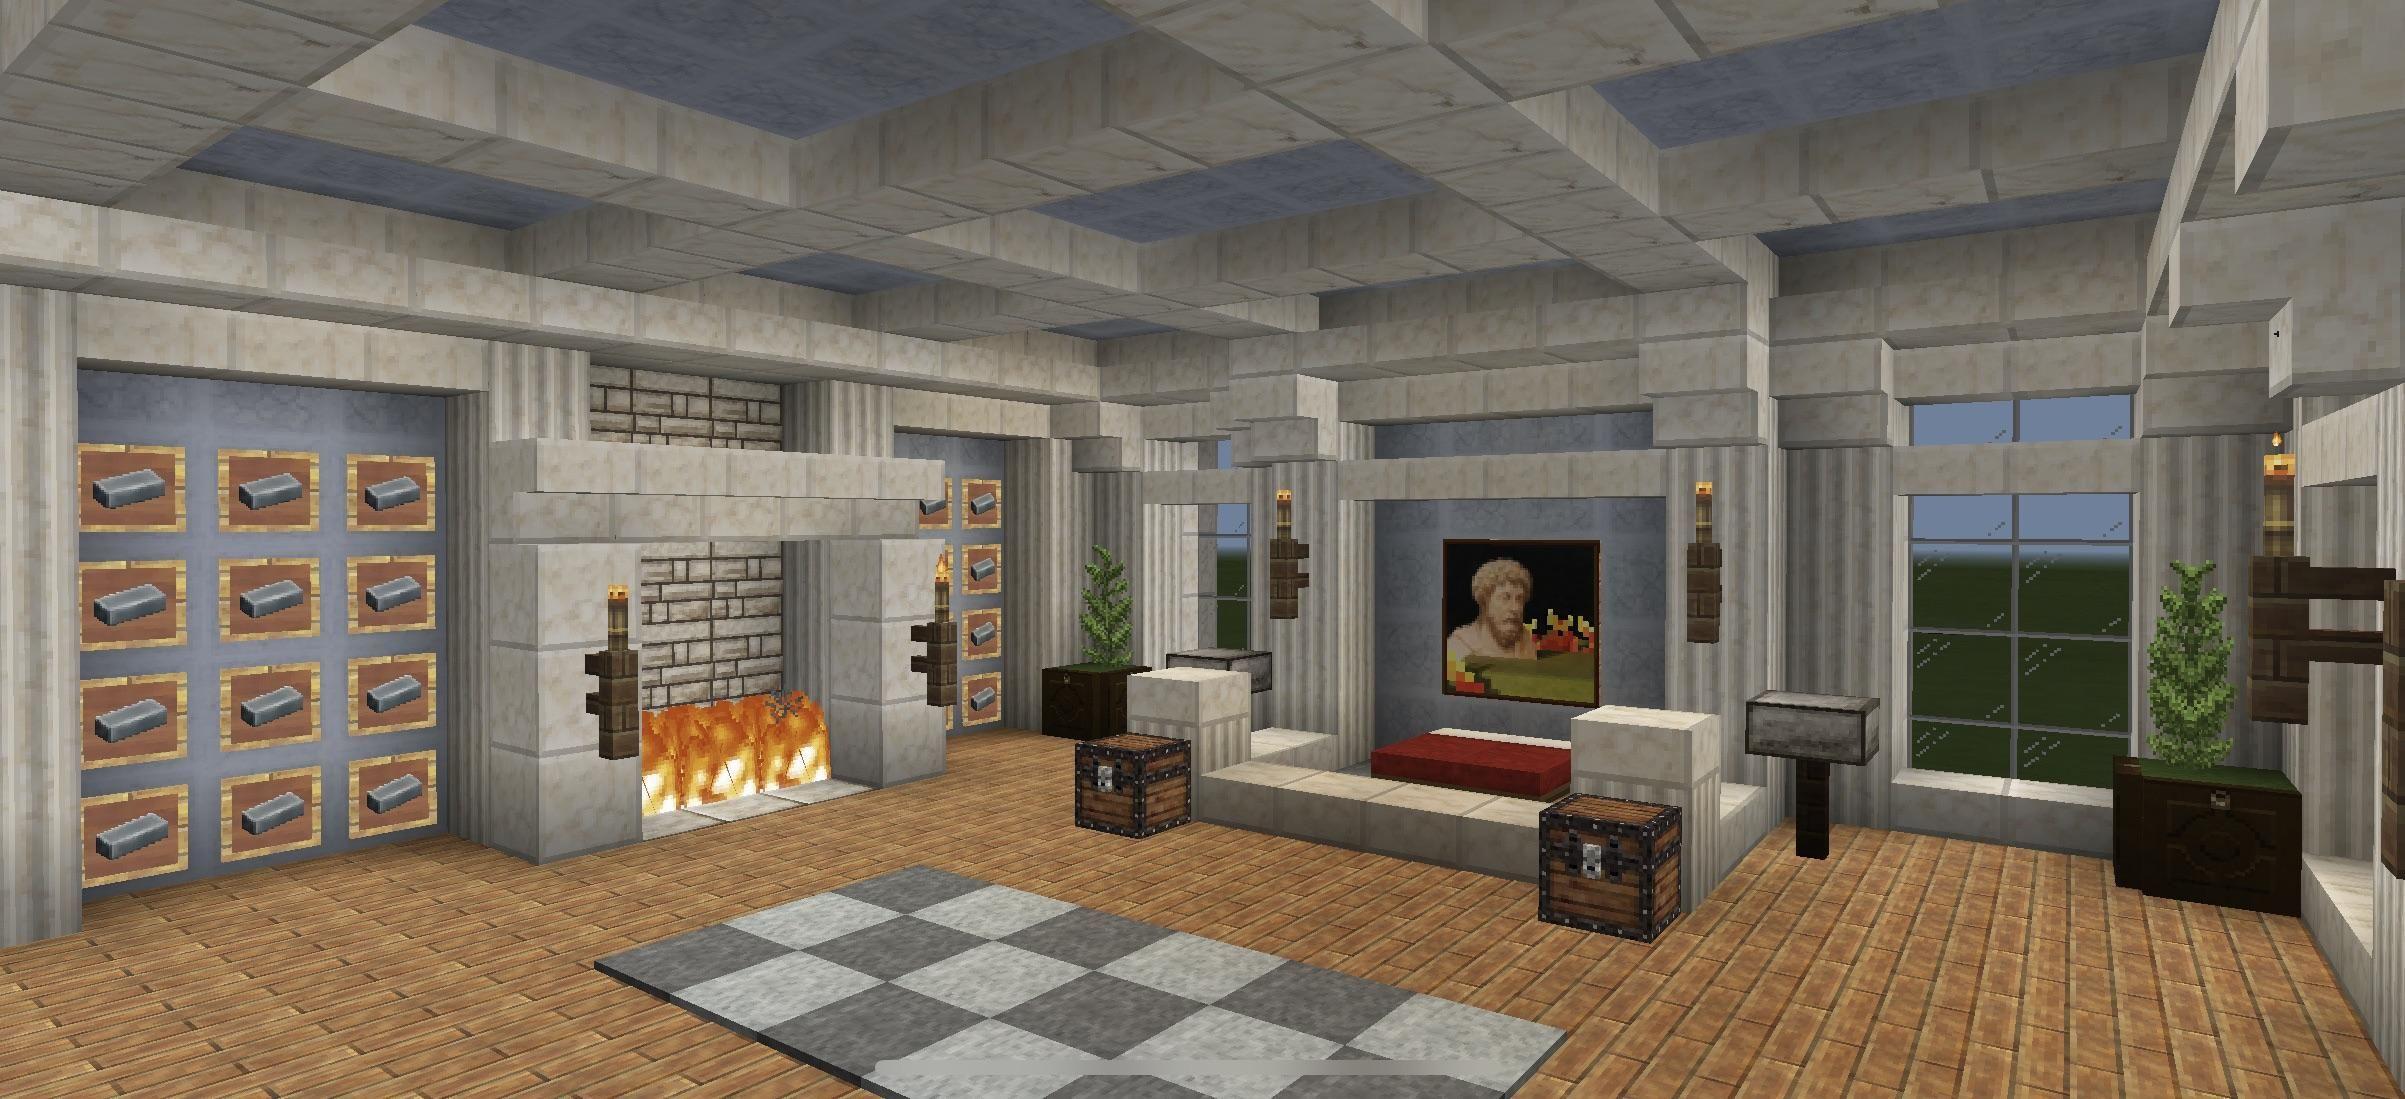 Bedroom Minecraft Minecraft House Designs Minecraft Room Minecraft Bedroom Luxury rooms in minecraft